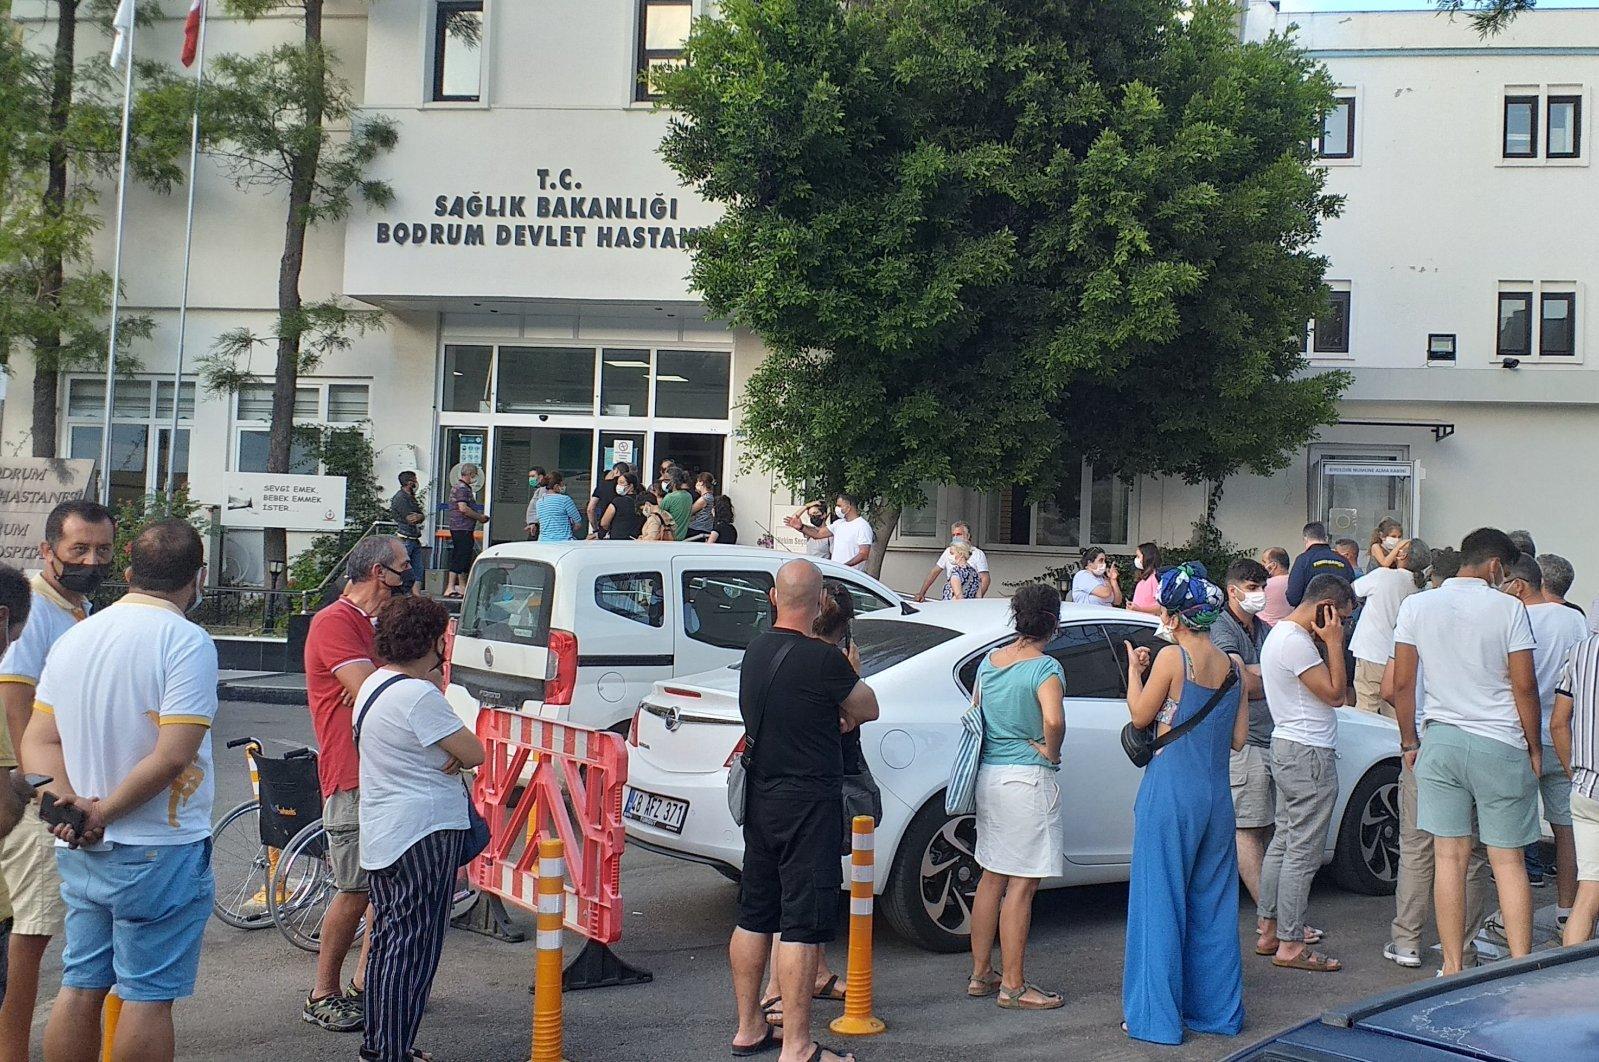 People wait outside a hospital for vaccination in Bodrum, in Muğla, southwestern Turkey, June 15, 2021. (İHA PHOTO)